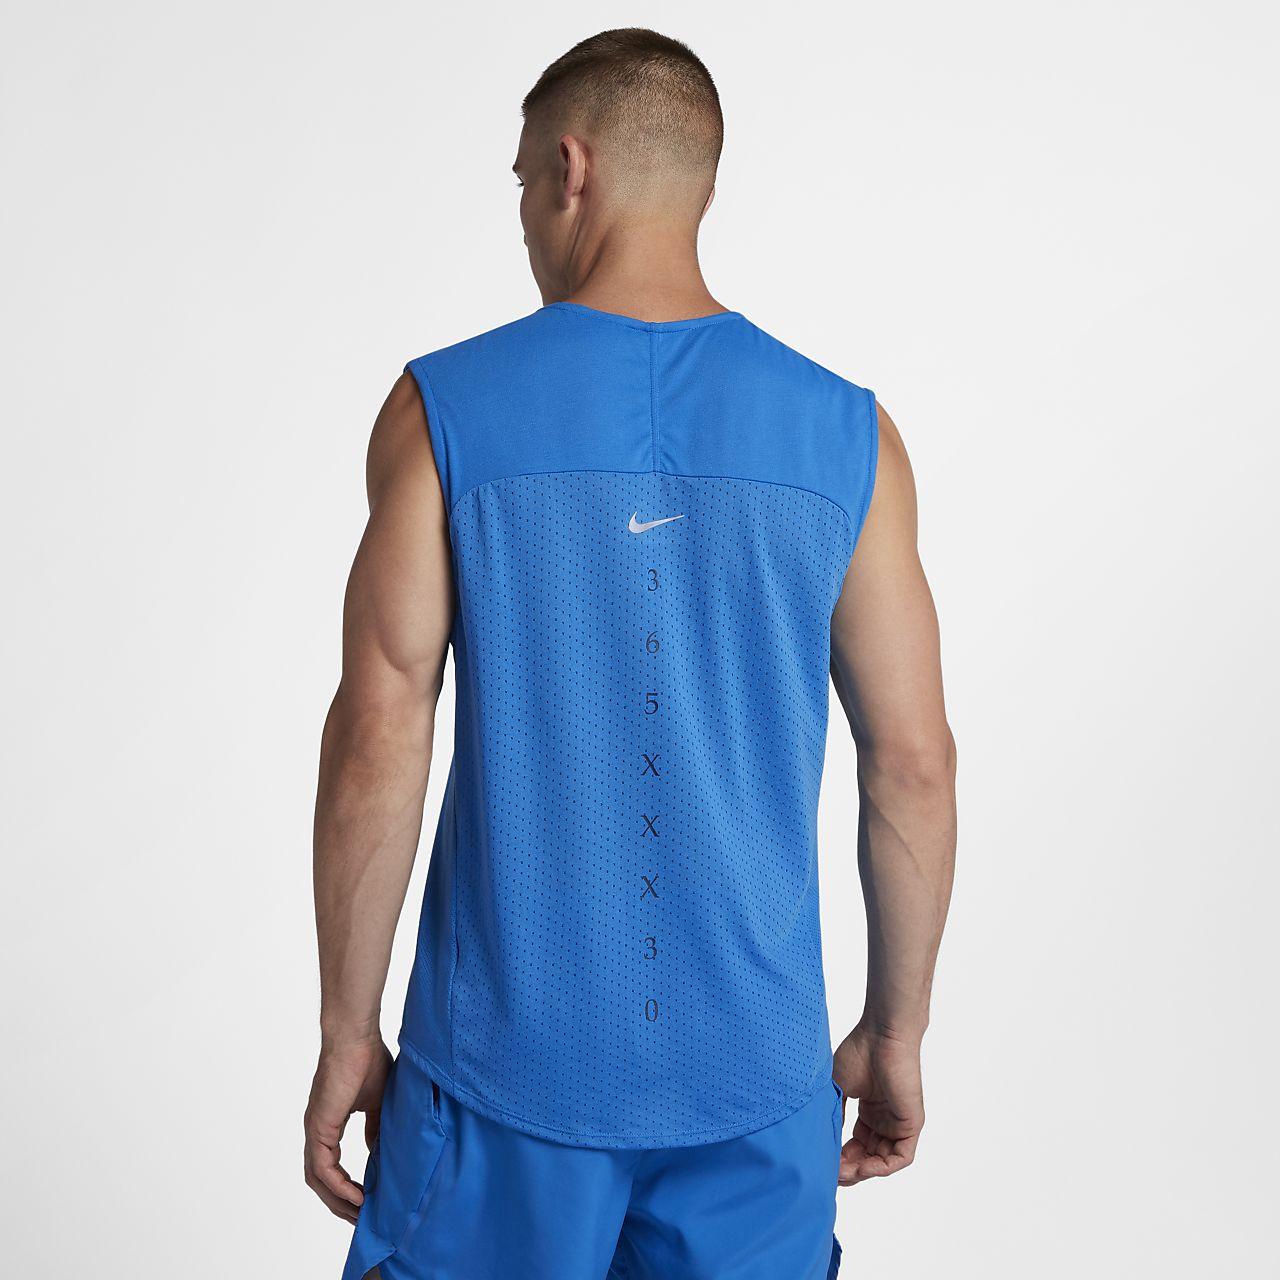 a46ad2c90786b Nike Rise 365 Men s Sleeveless Running Top. Nike.com AU